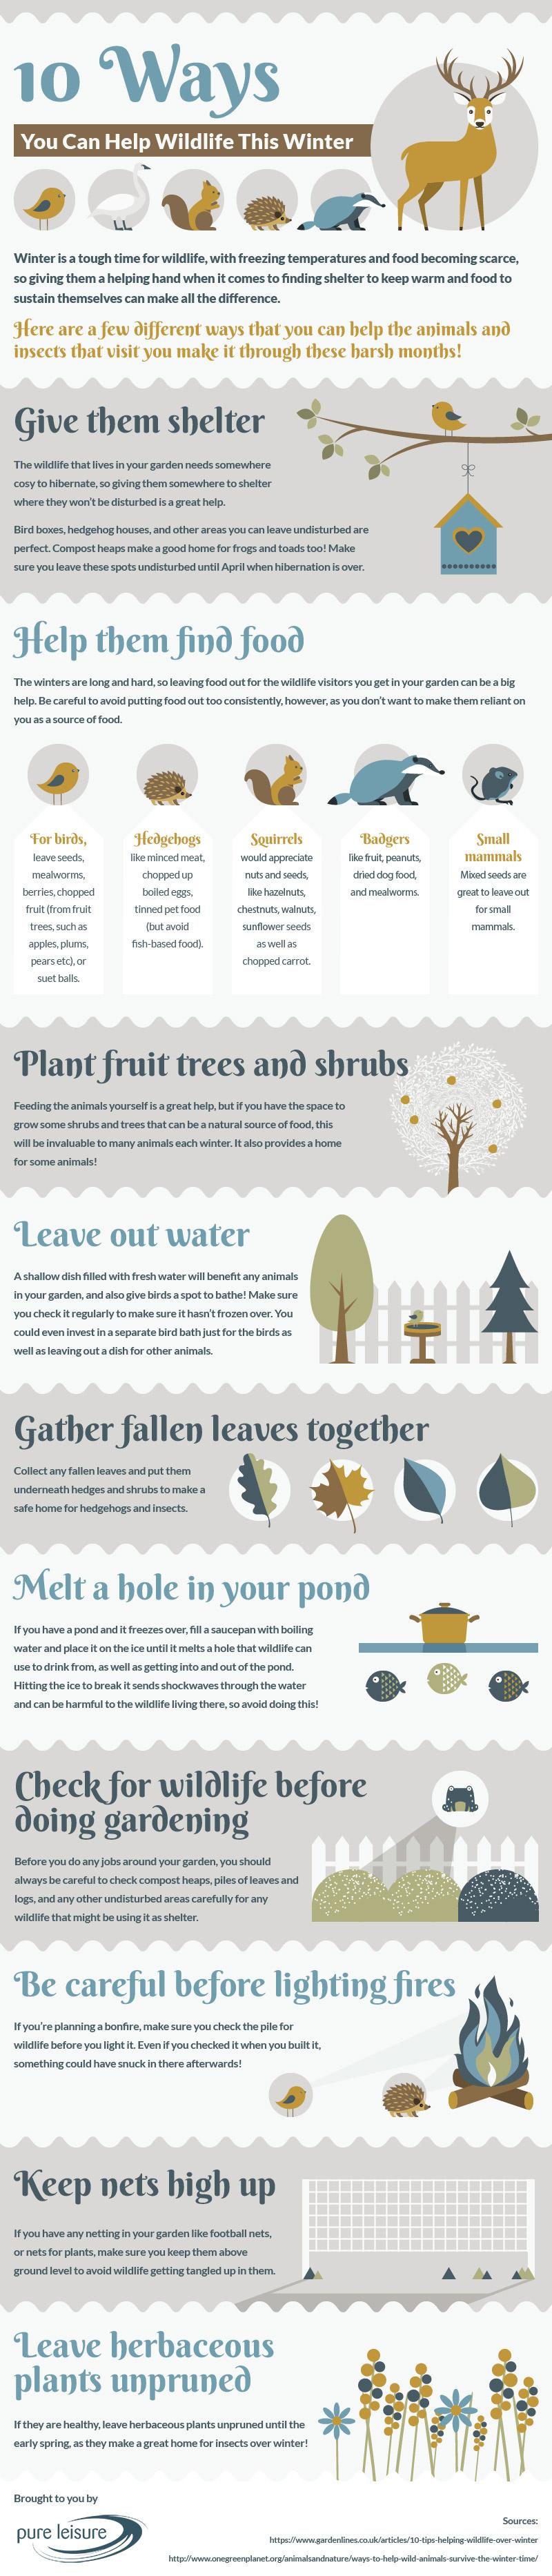 Help Wildlife This Winter